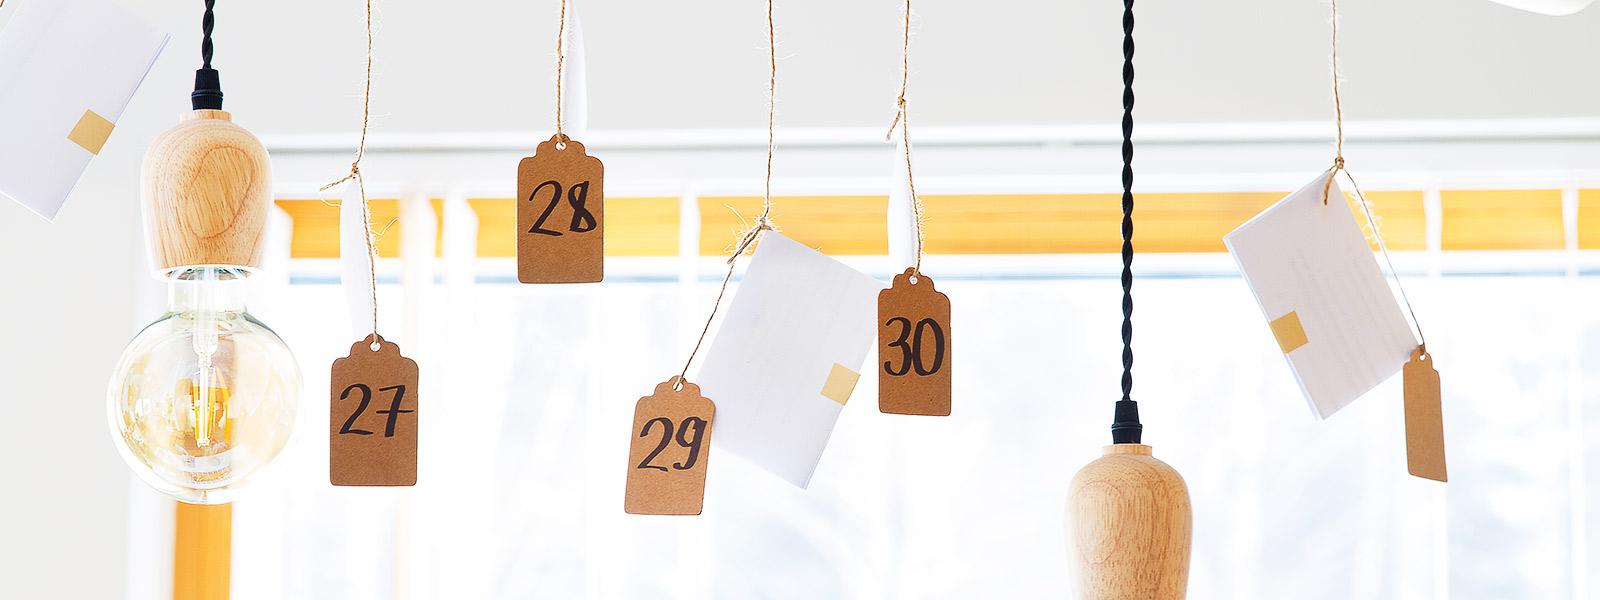 адвент-календарь 2019